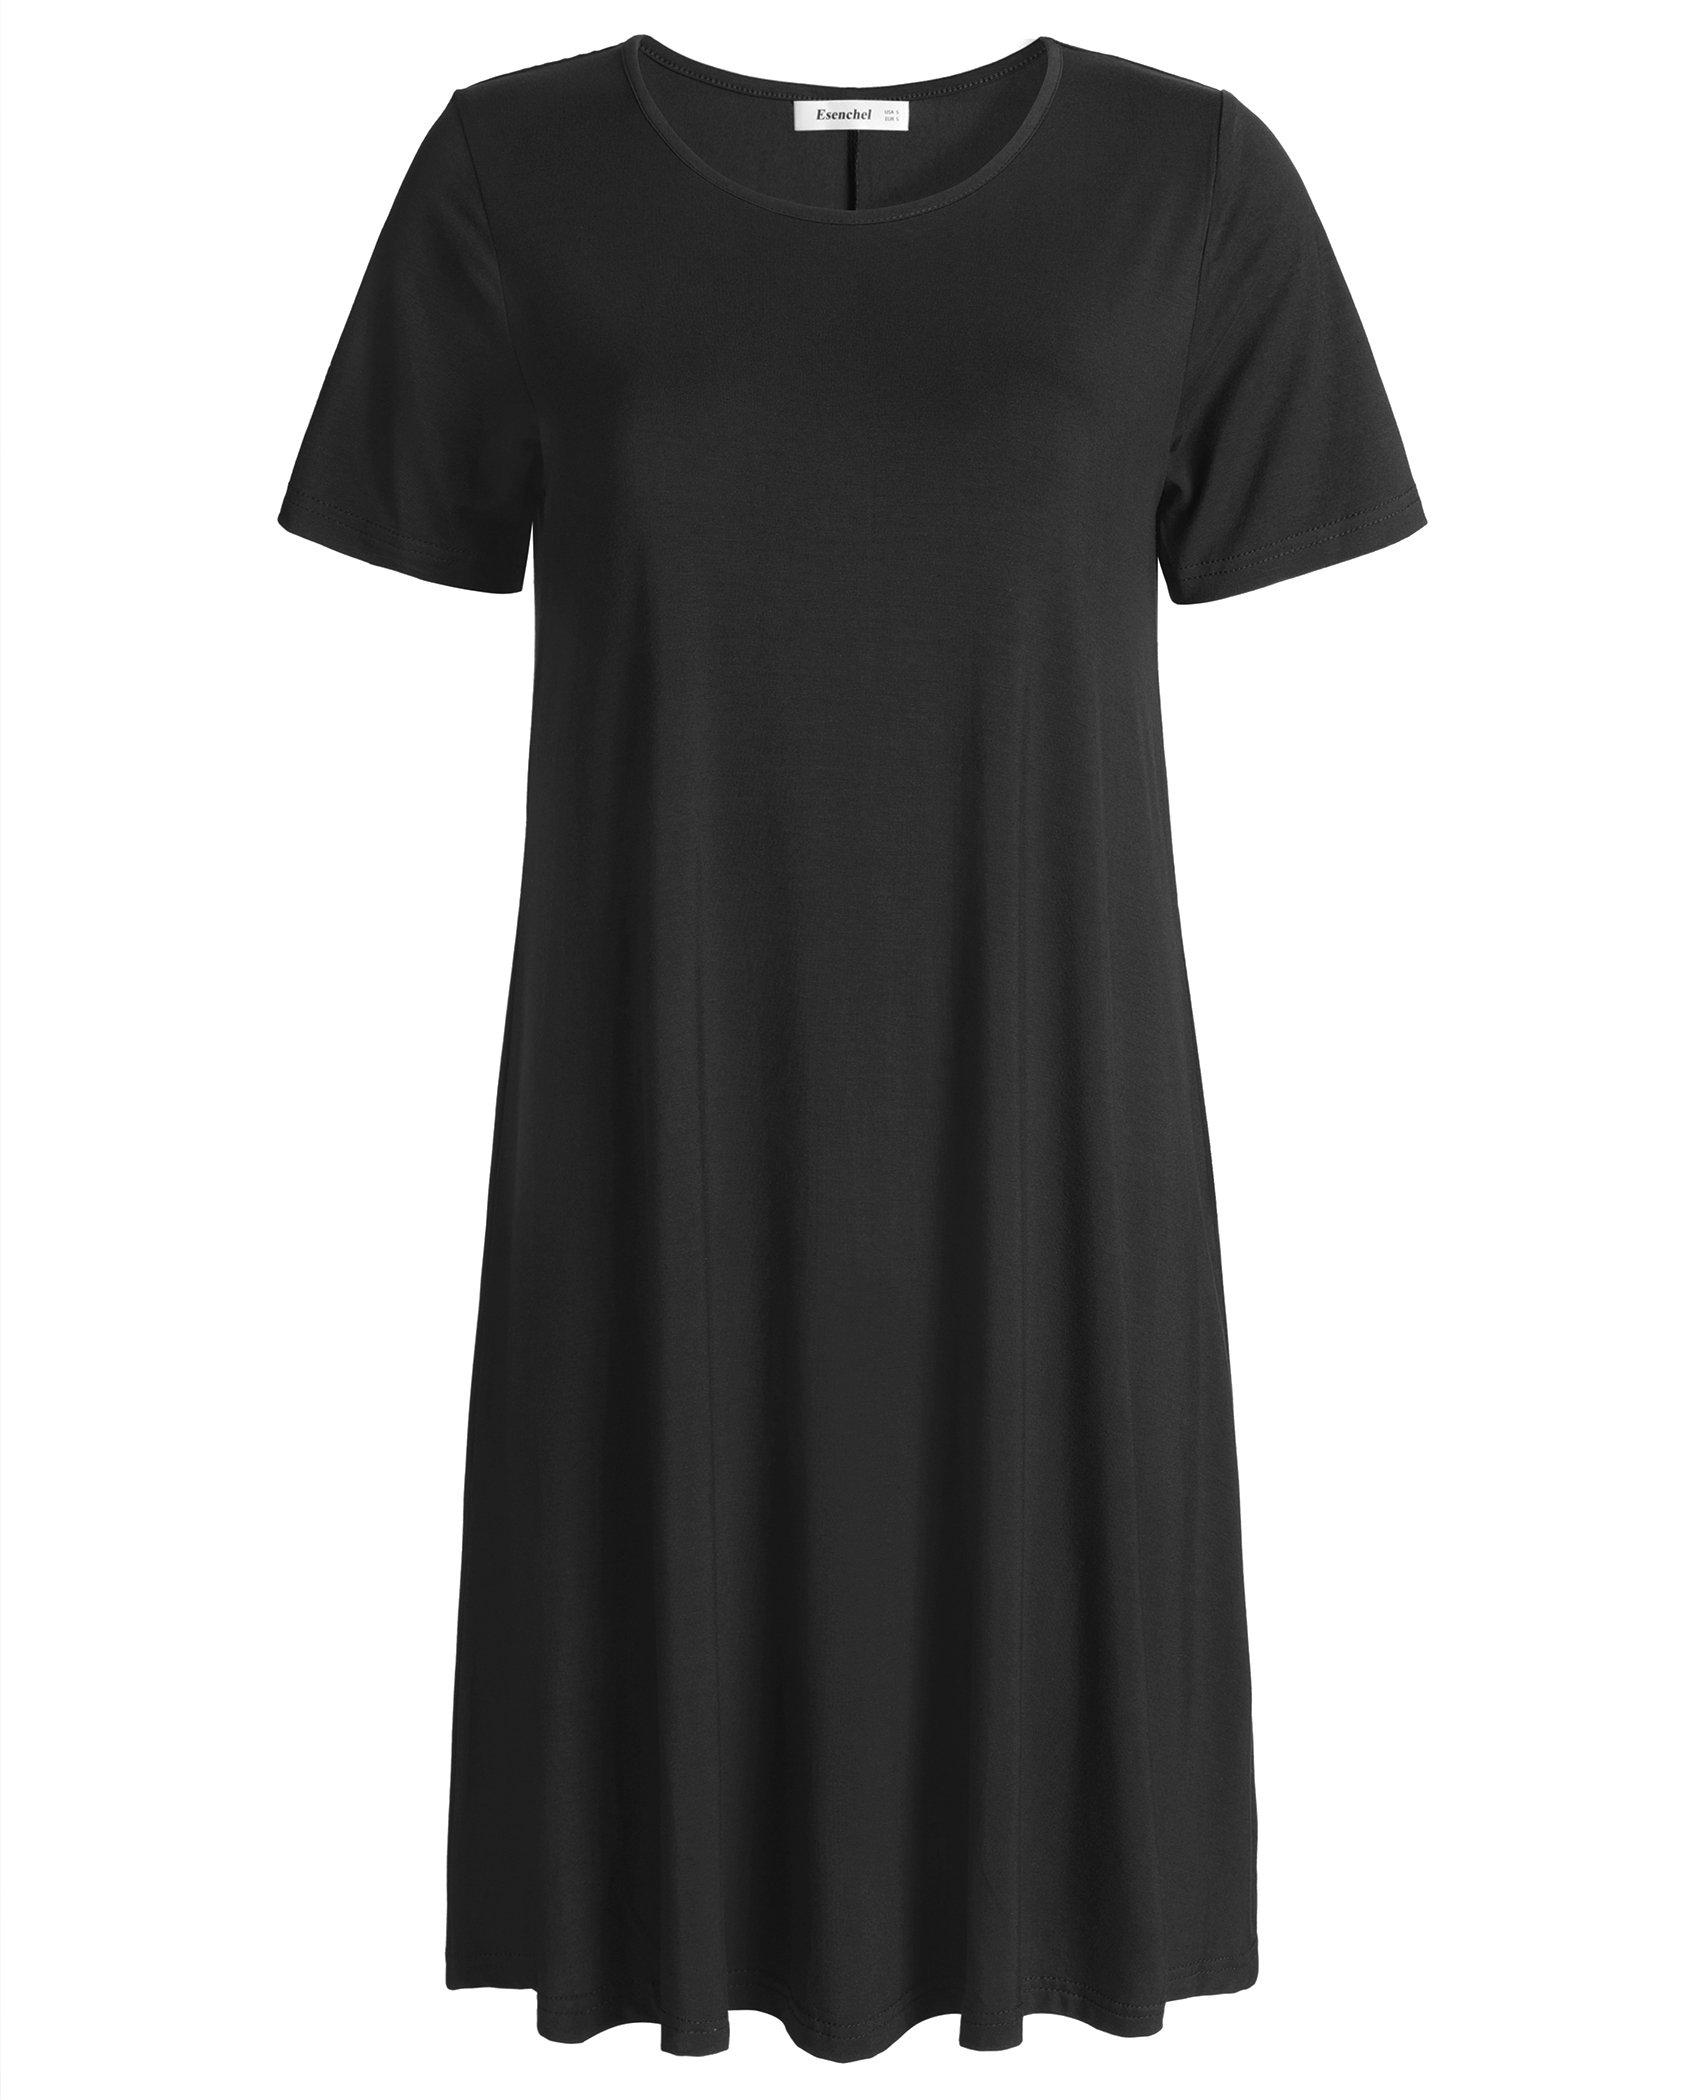 Esenchel Women's Swing T-Shirt Dress Short Sleeve Casual Dress M Black